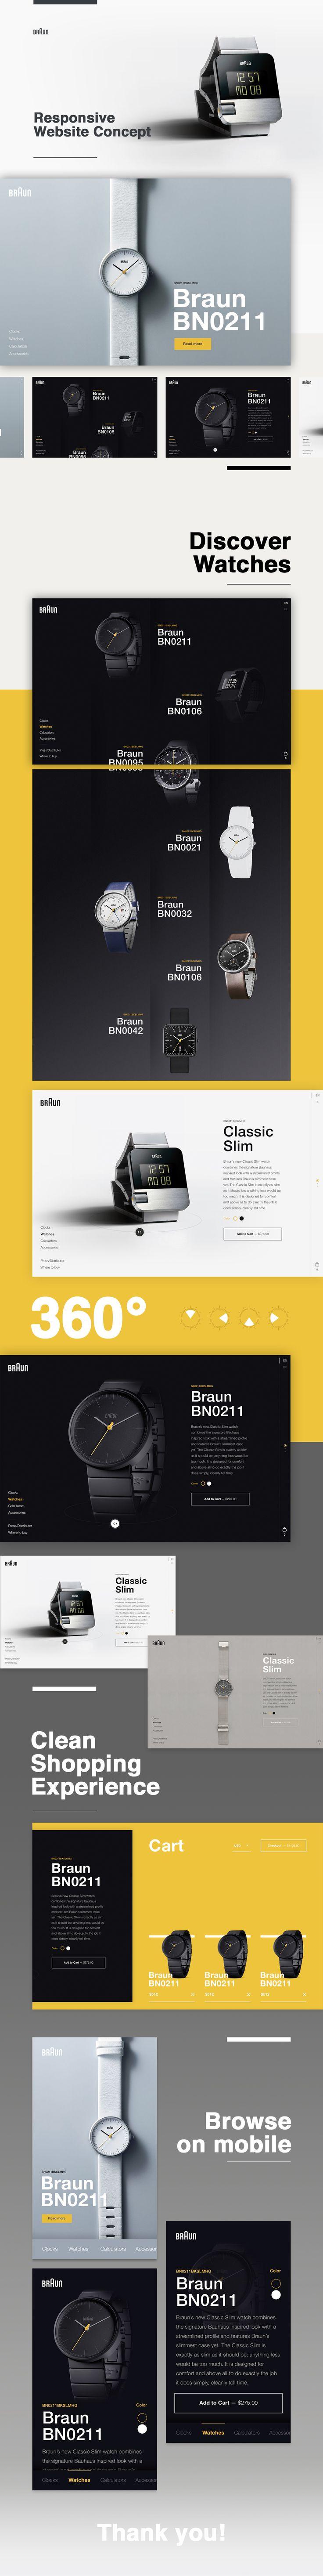 Braun Responsive Website Concept on Behance